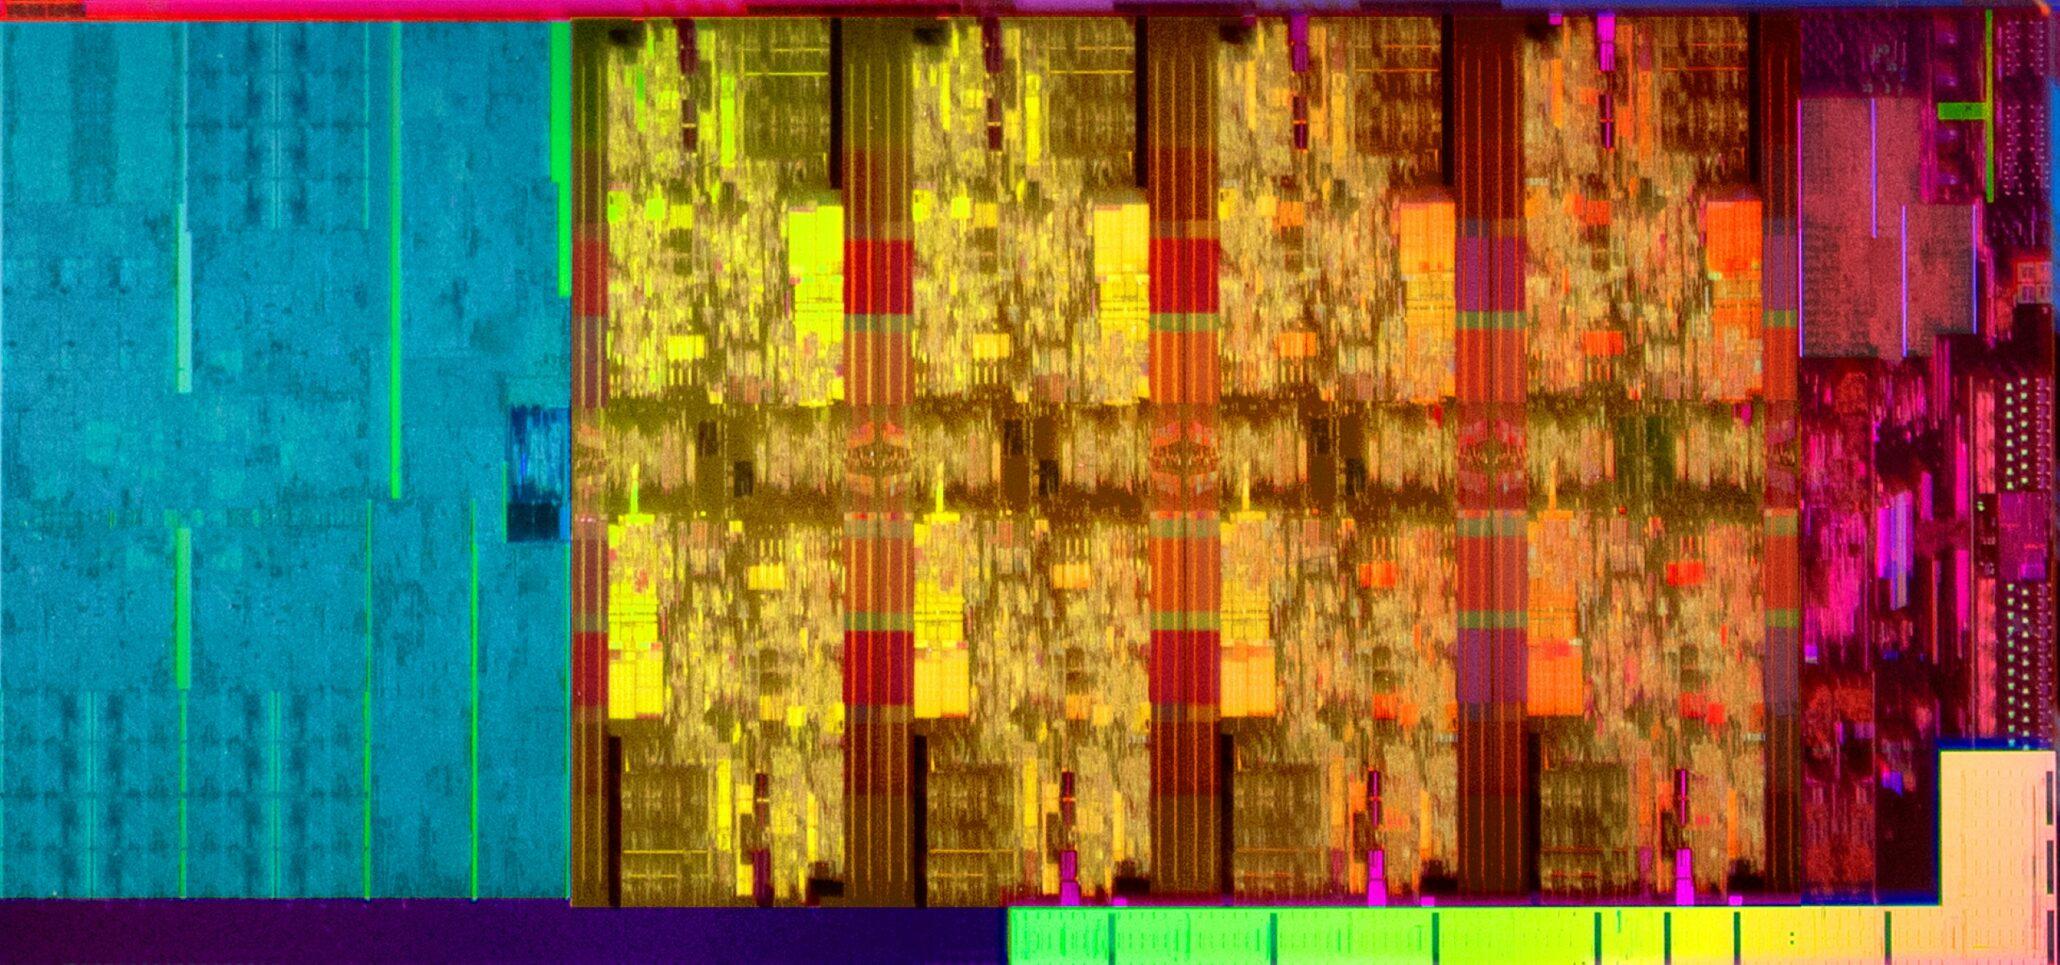 Intel ответила на слухи о закрытии разработки 10 нм техпроцесса